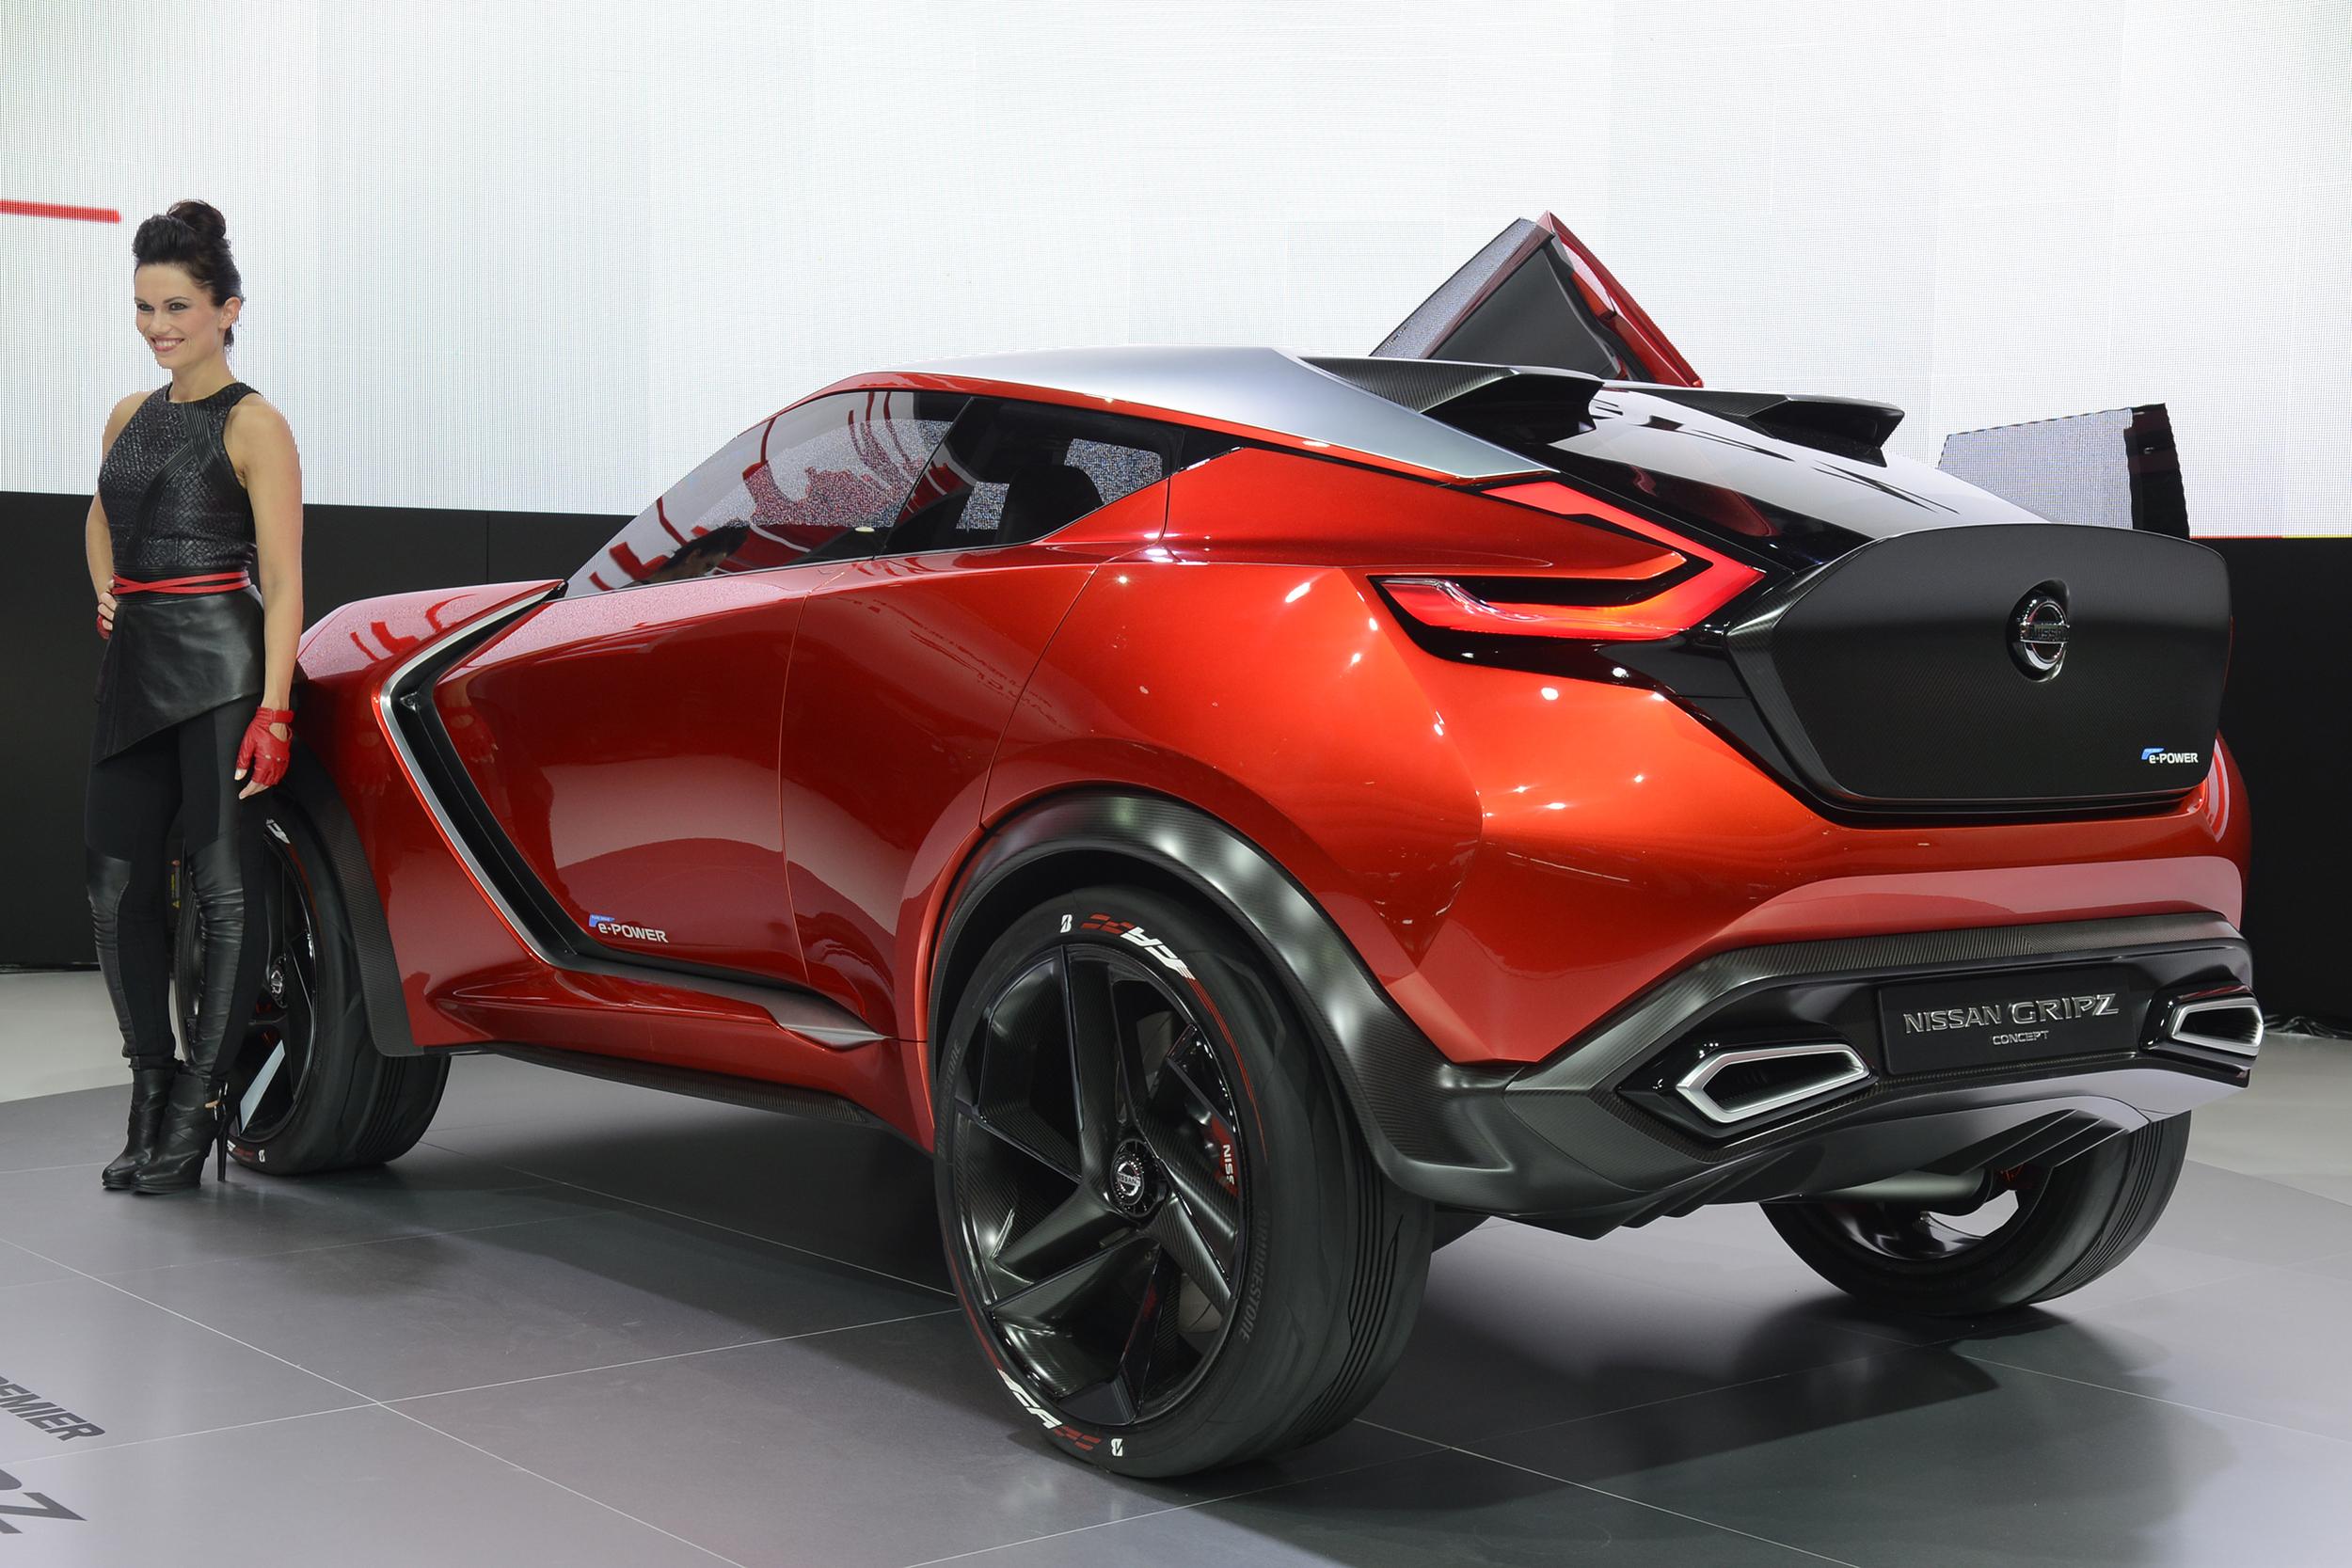 Nissan reveals new Gripz concept in Frankfurt